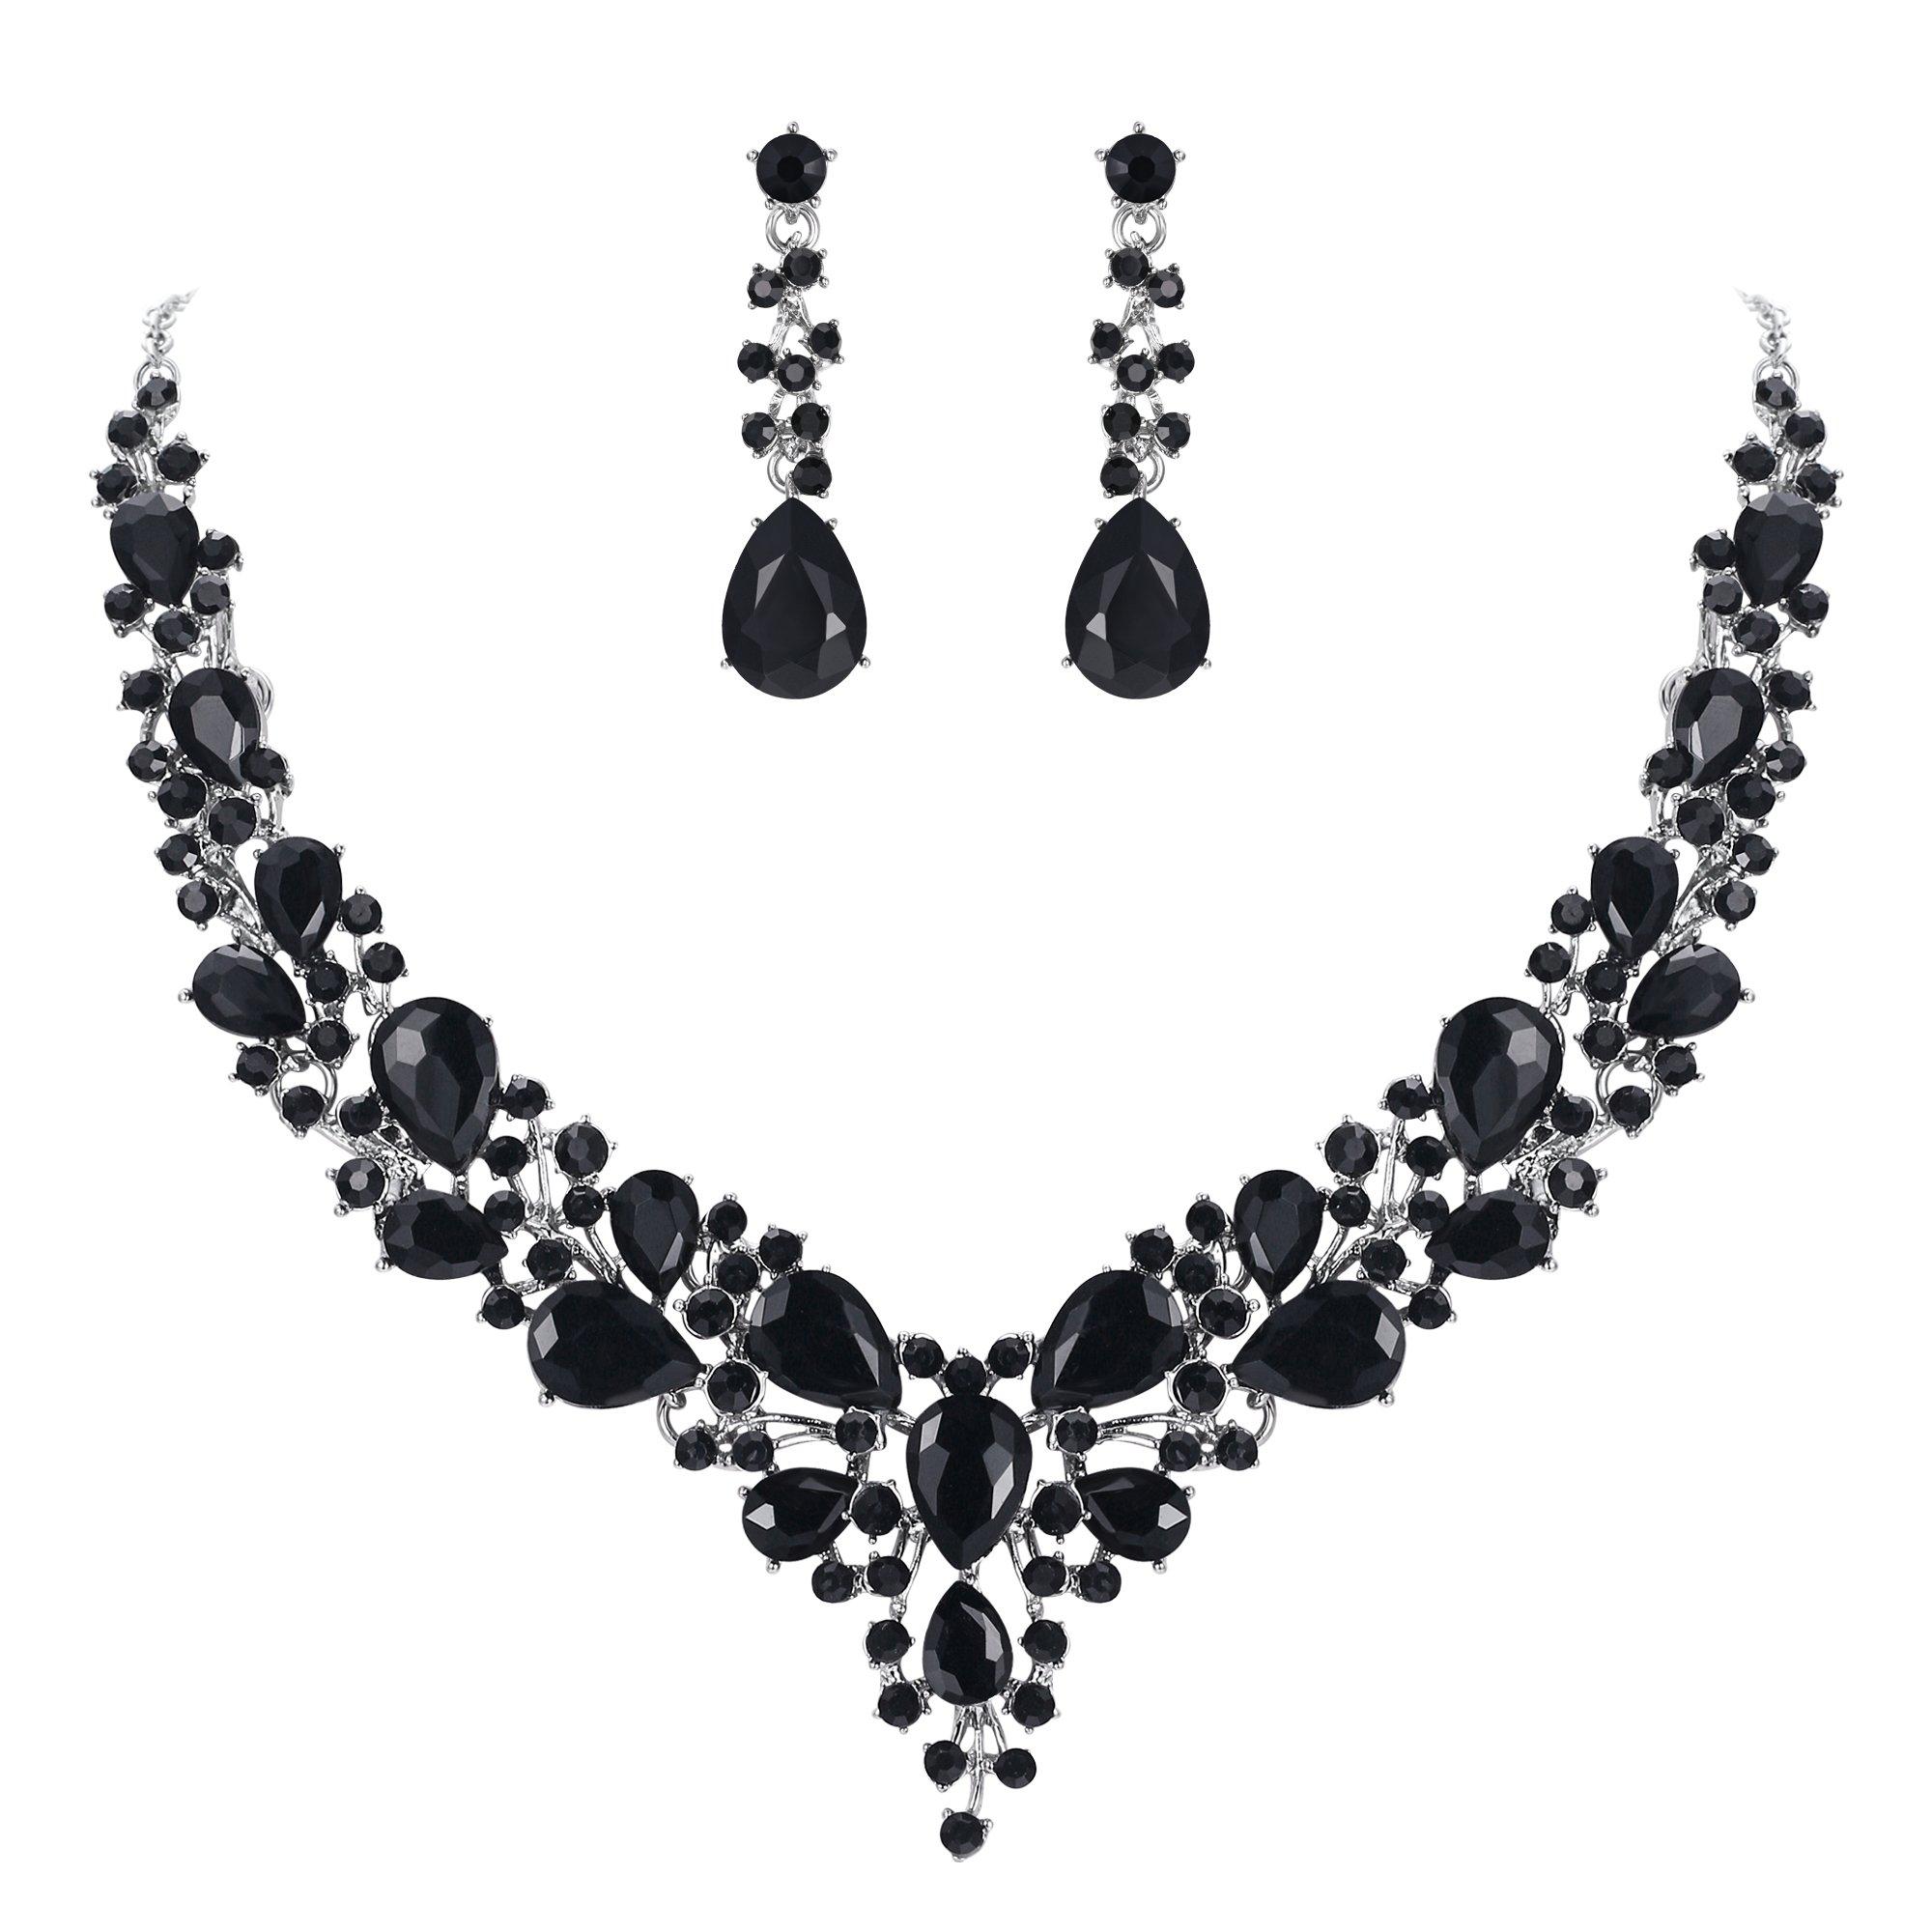 BriLove Wedding Bridal Necklace Earrings Jewelry Set for Women Austrian Crystal Teardrop Cluster Statement Necklace Dangle Earrings Set Black Silver-Tone